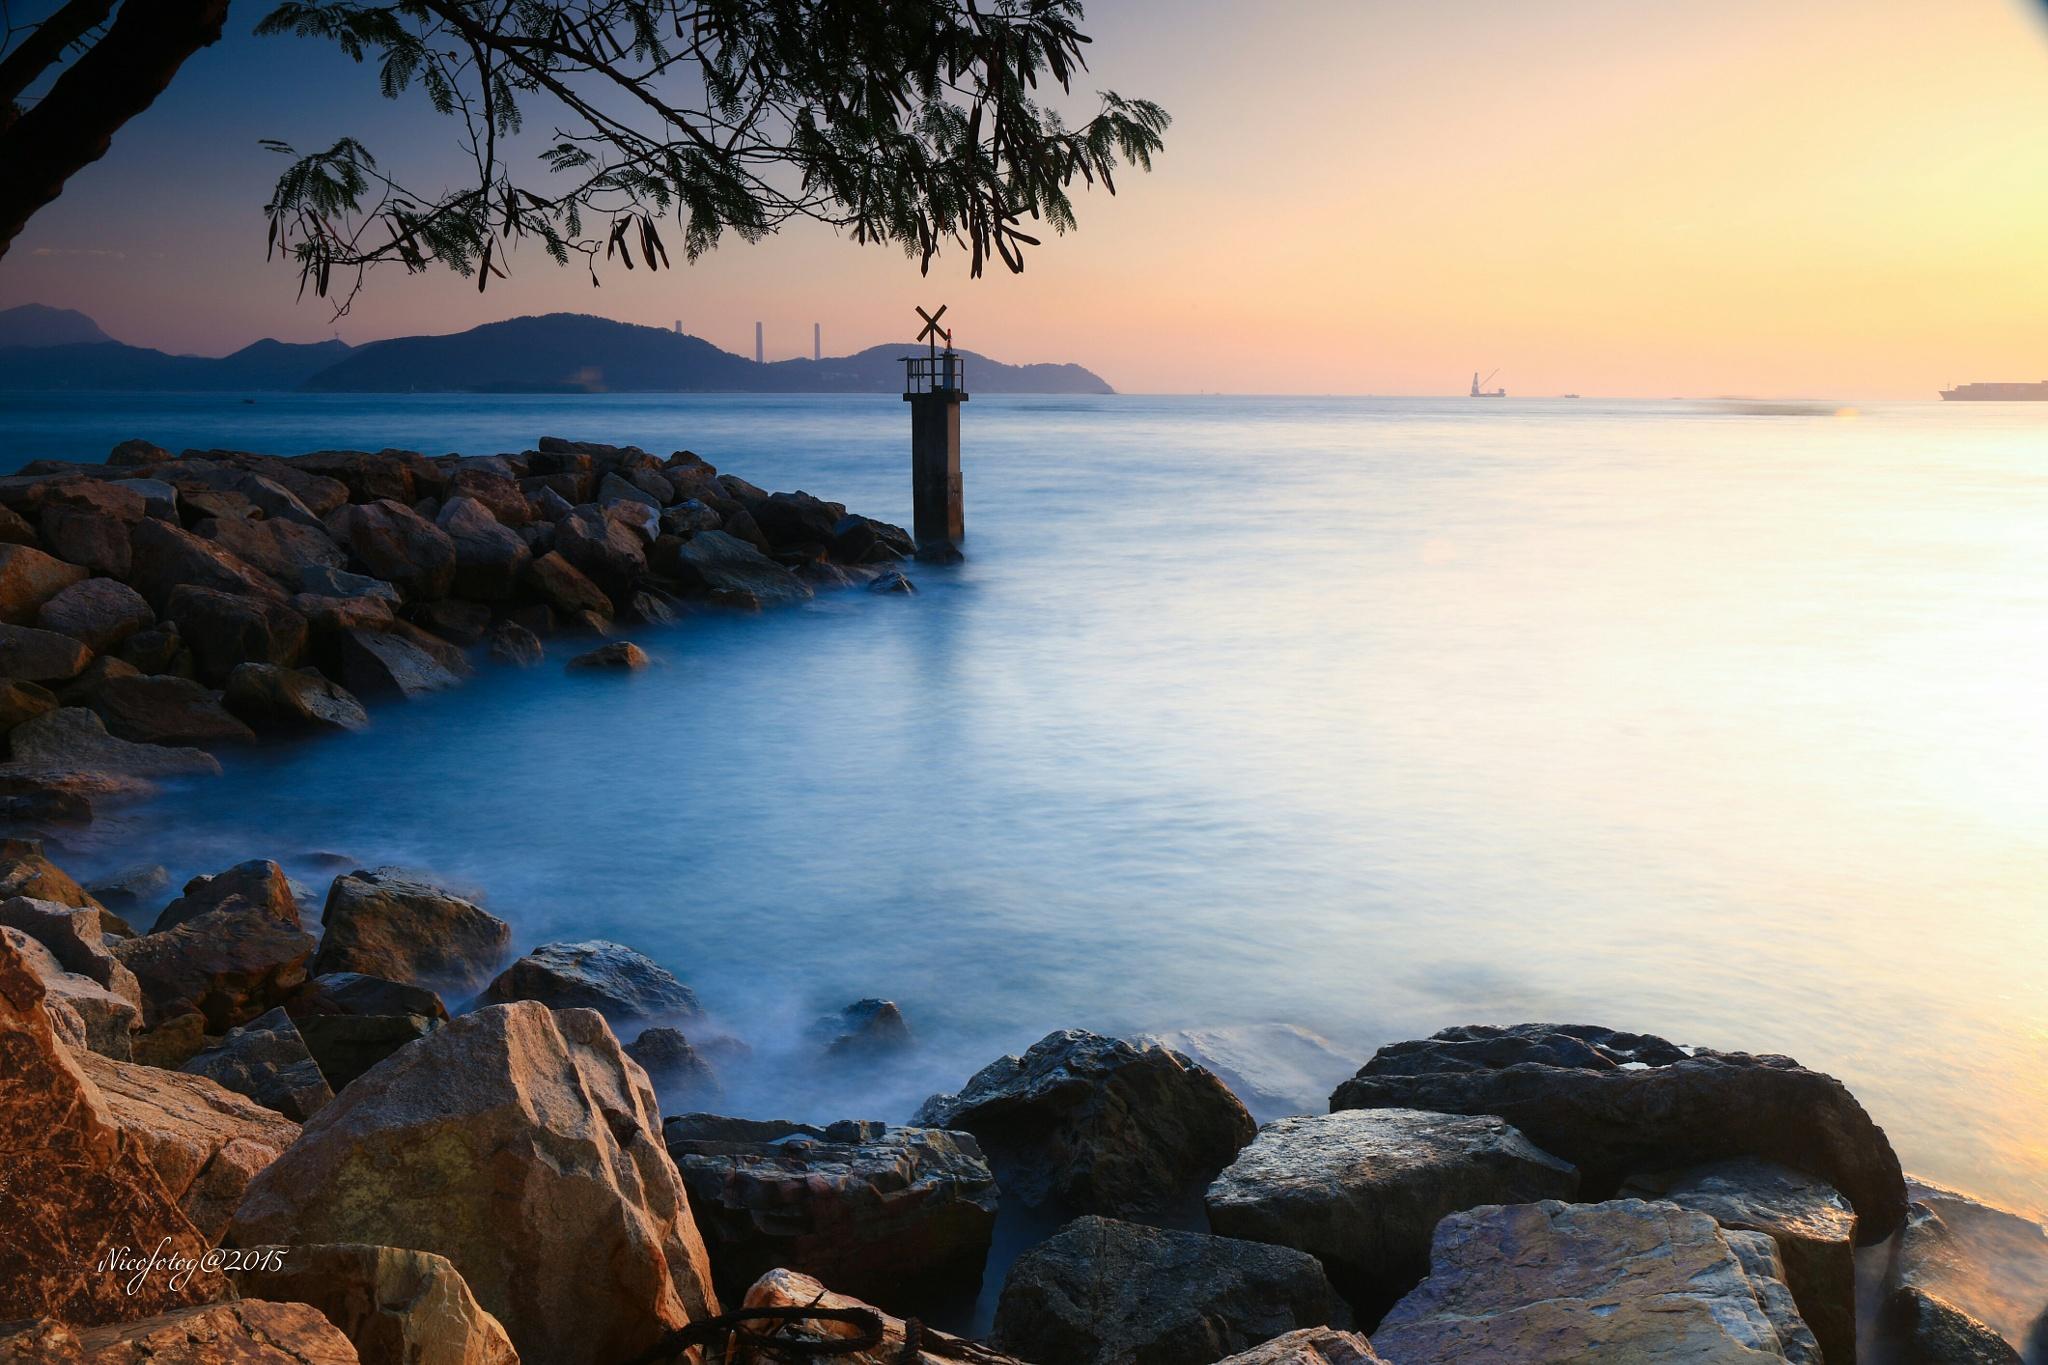 Sunset@Sandy bay_4 by Nicofotog